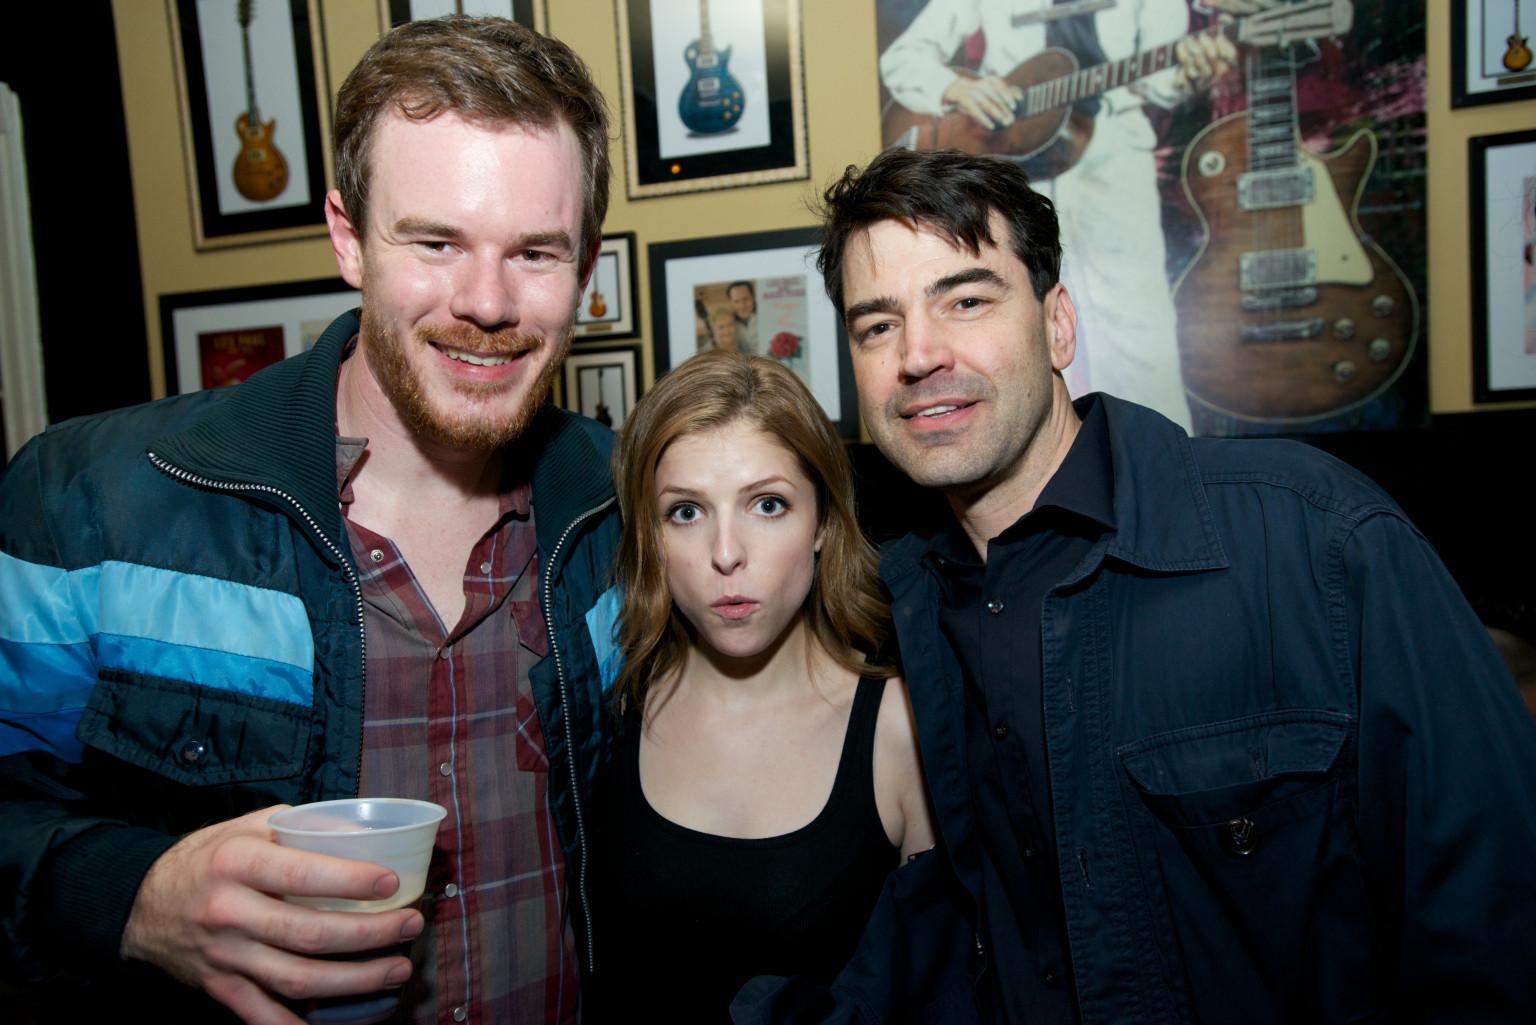 Joe Swanberg, 'Drinking Buddies' Director, Expands His ...